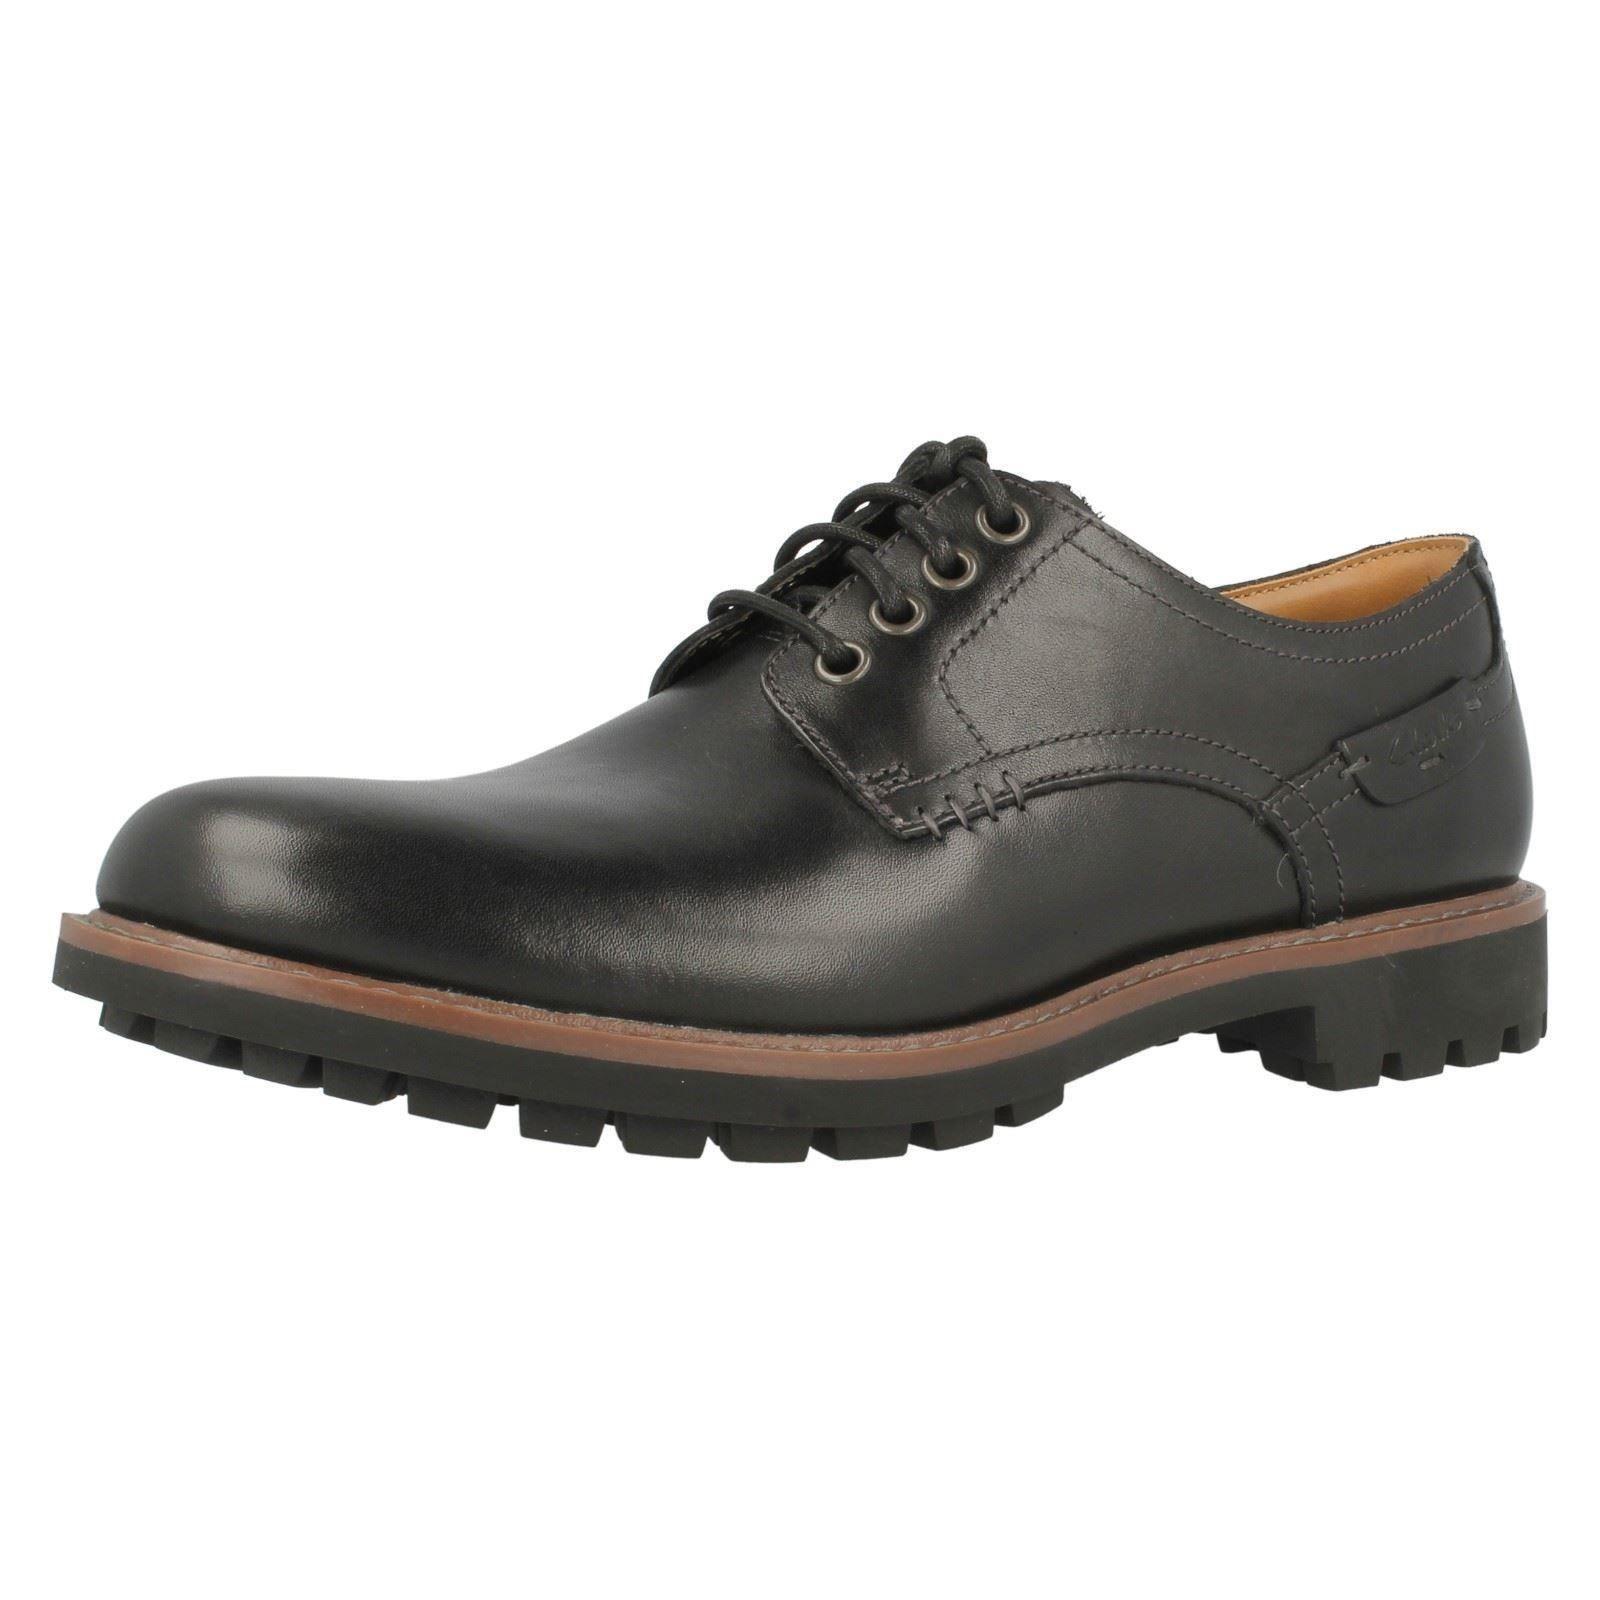 Clarks Gibson Shoe